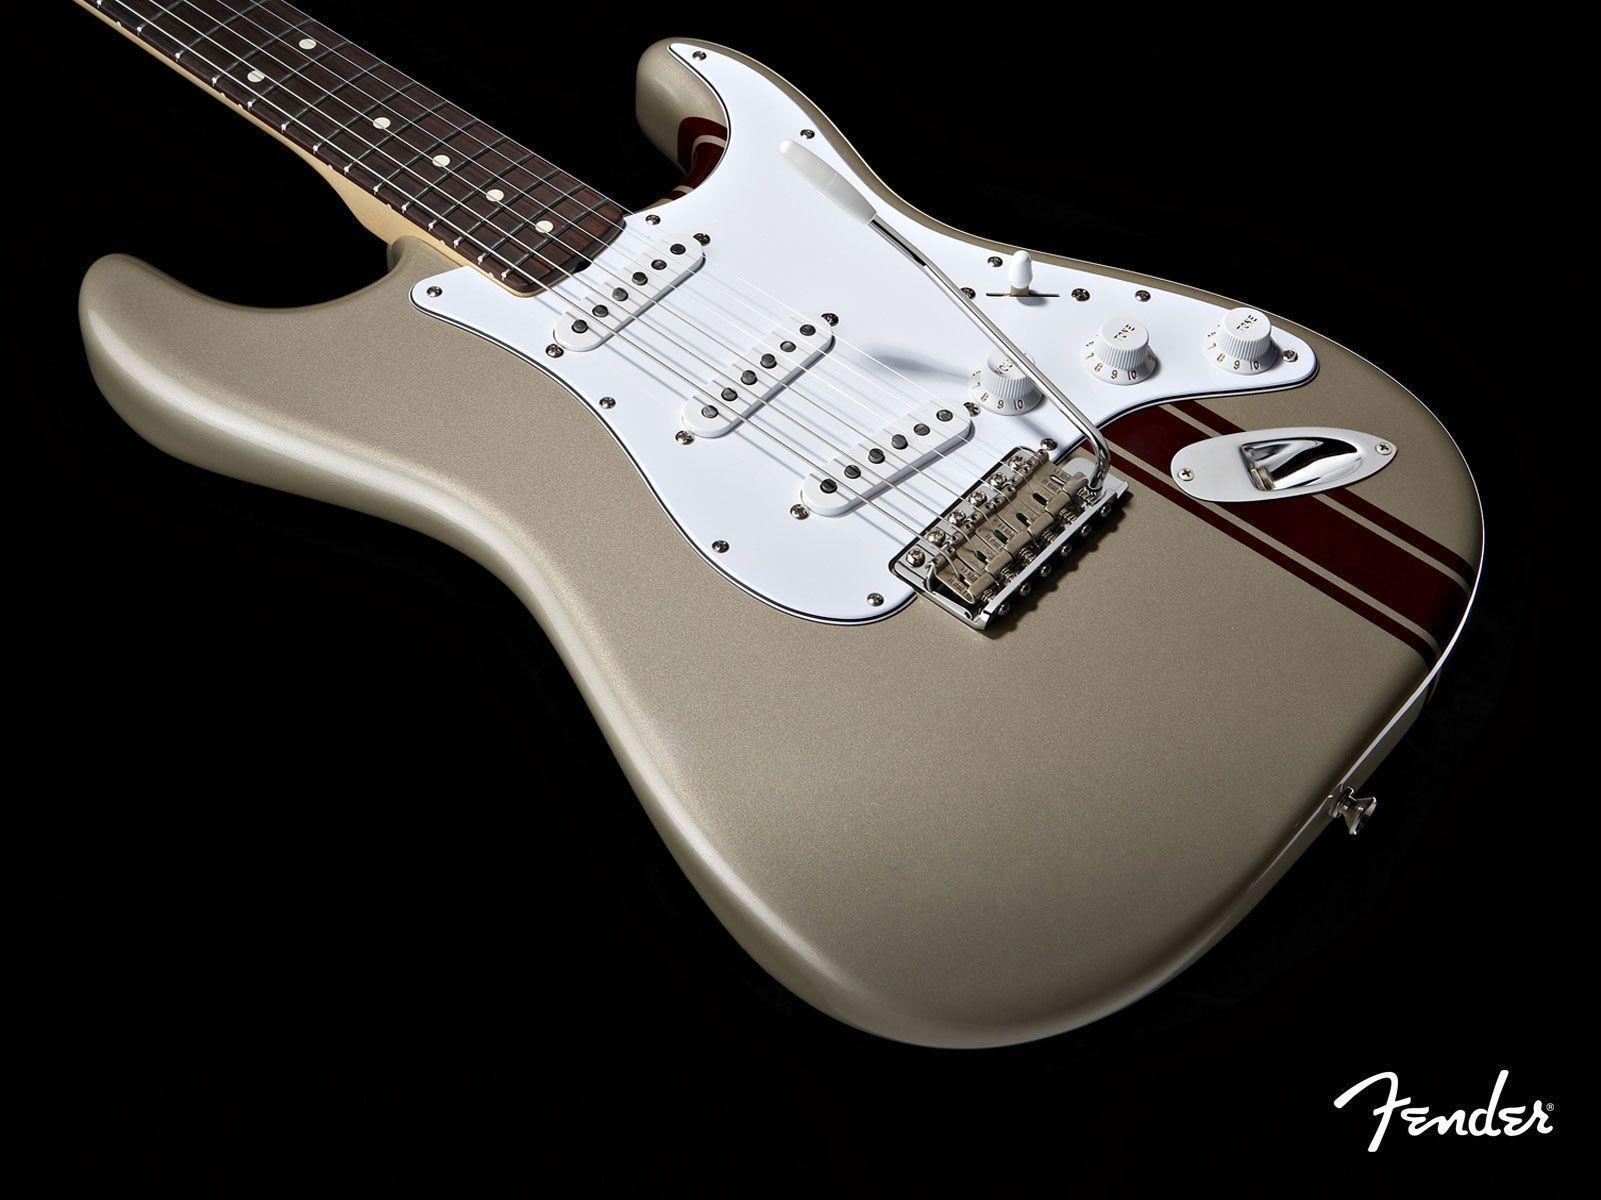 Wallpapers For > Fender Guitar Wallpapers For Desktop